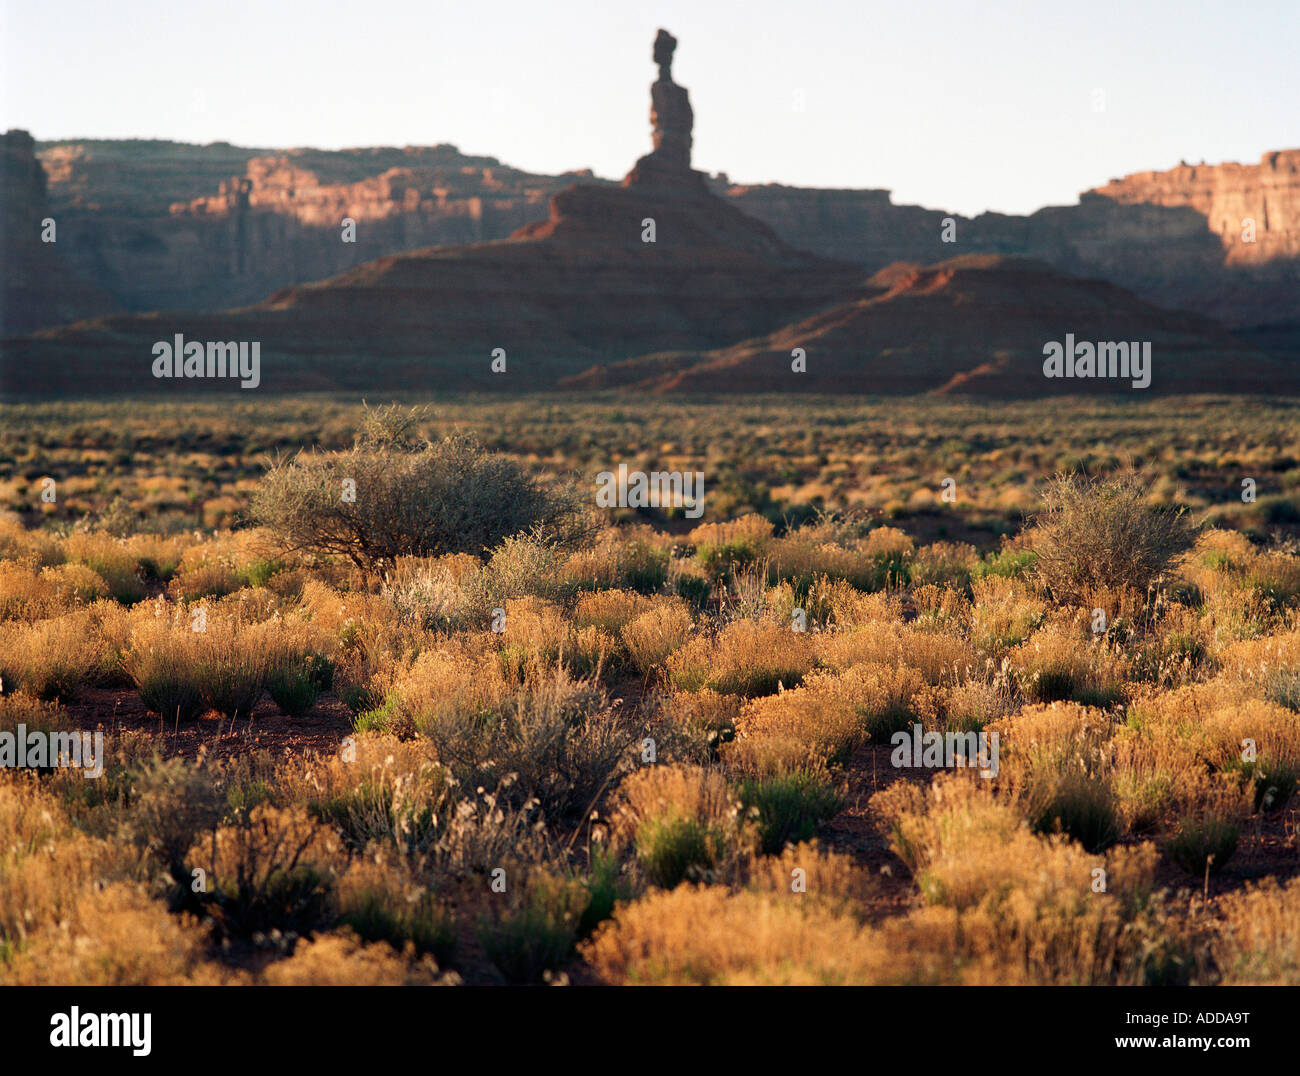 Valley of the Gods Utah - Stock Image